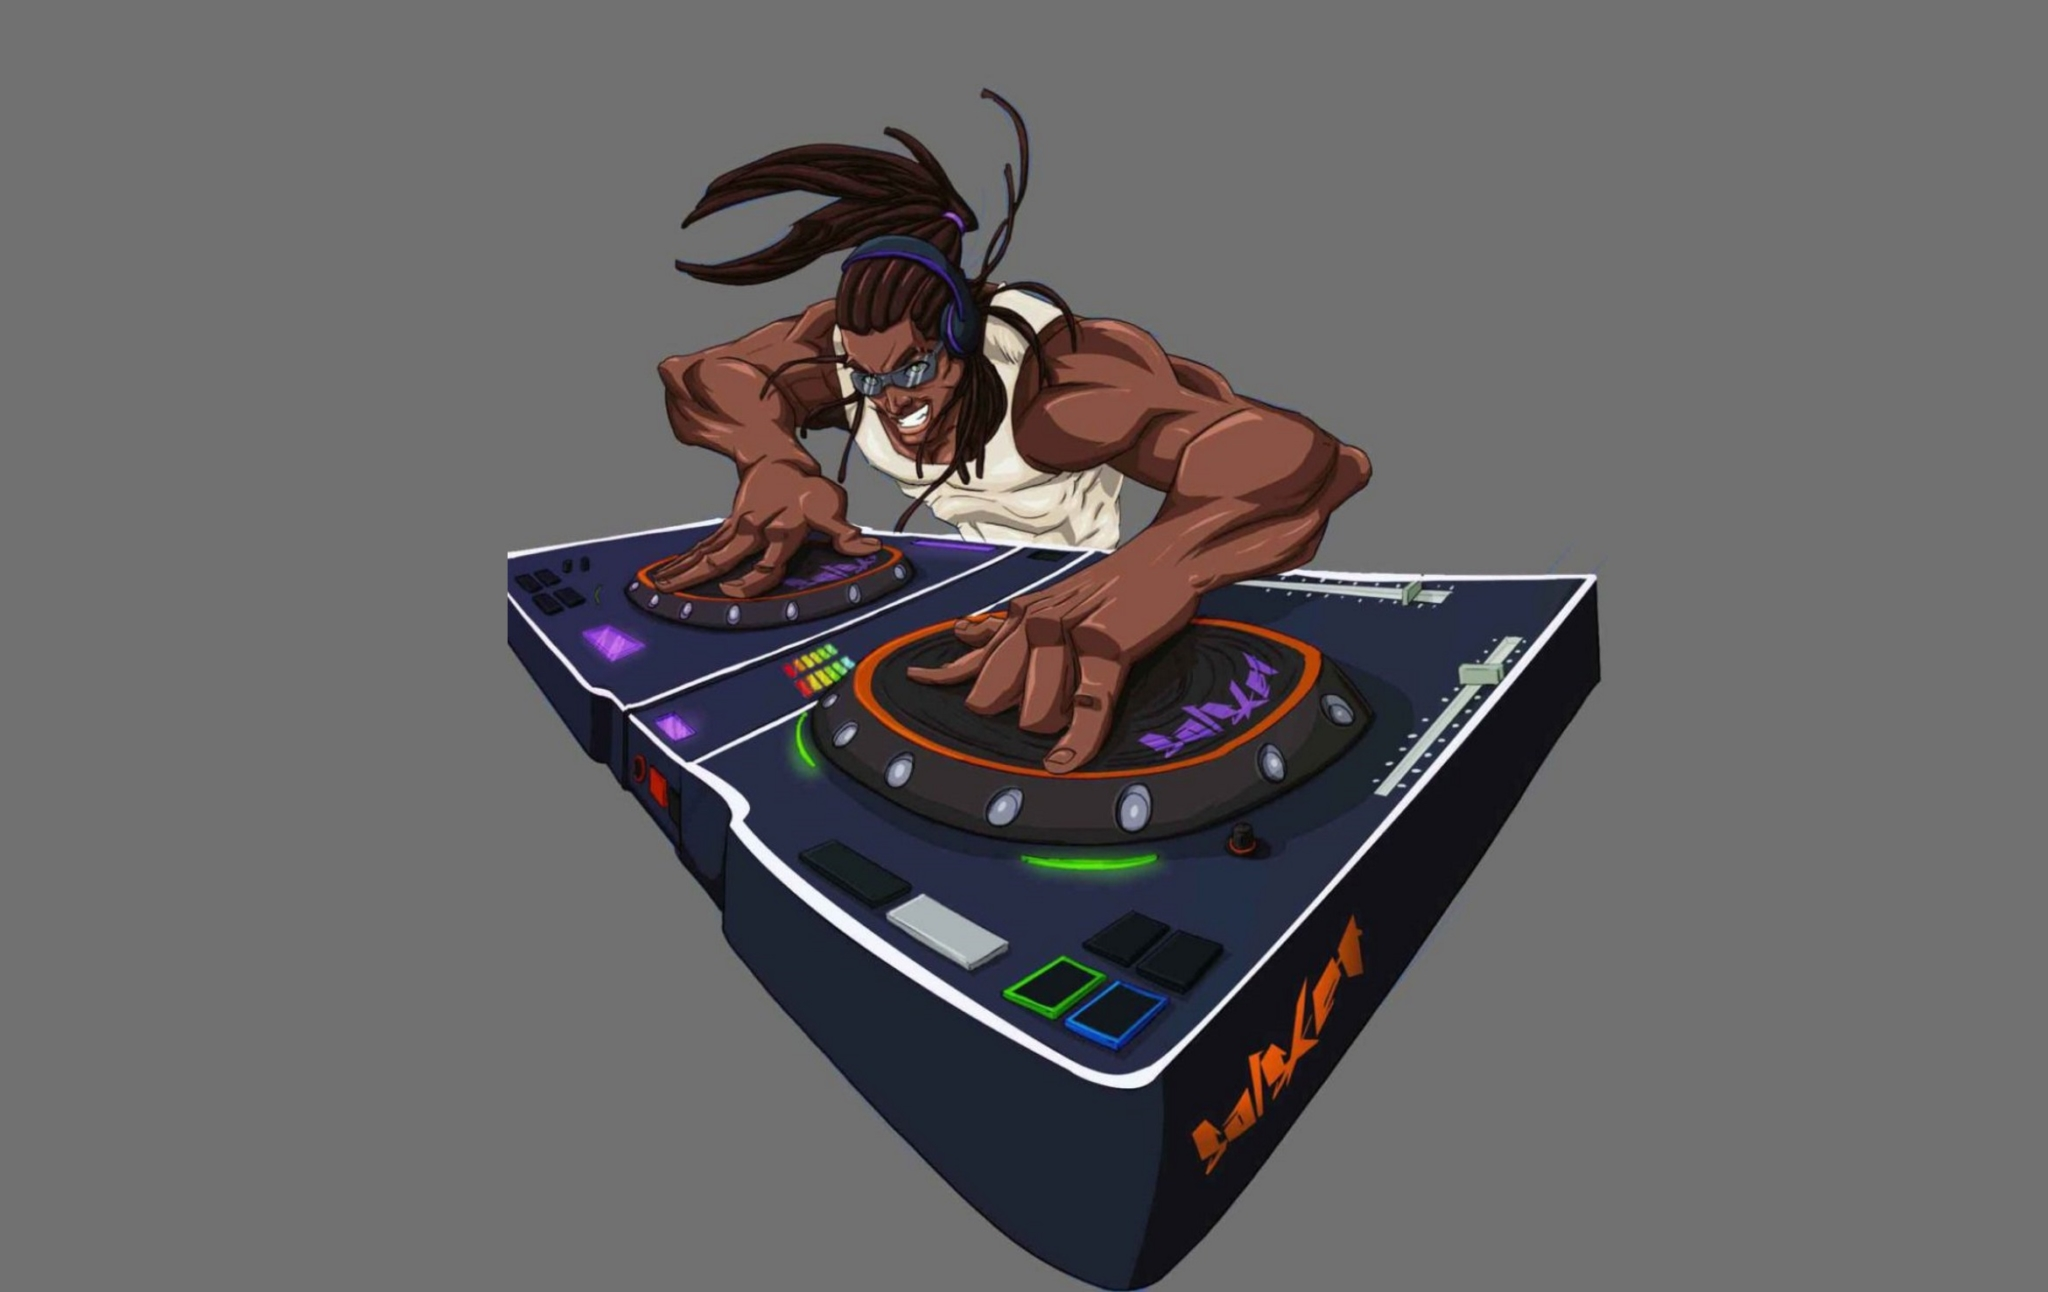 2D DJ Afro Character Illustration